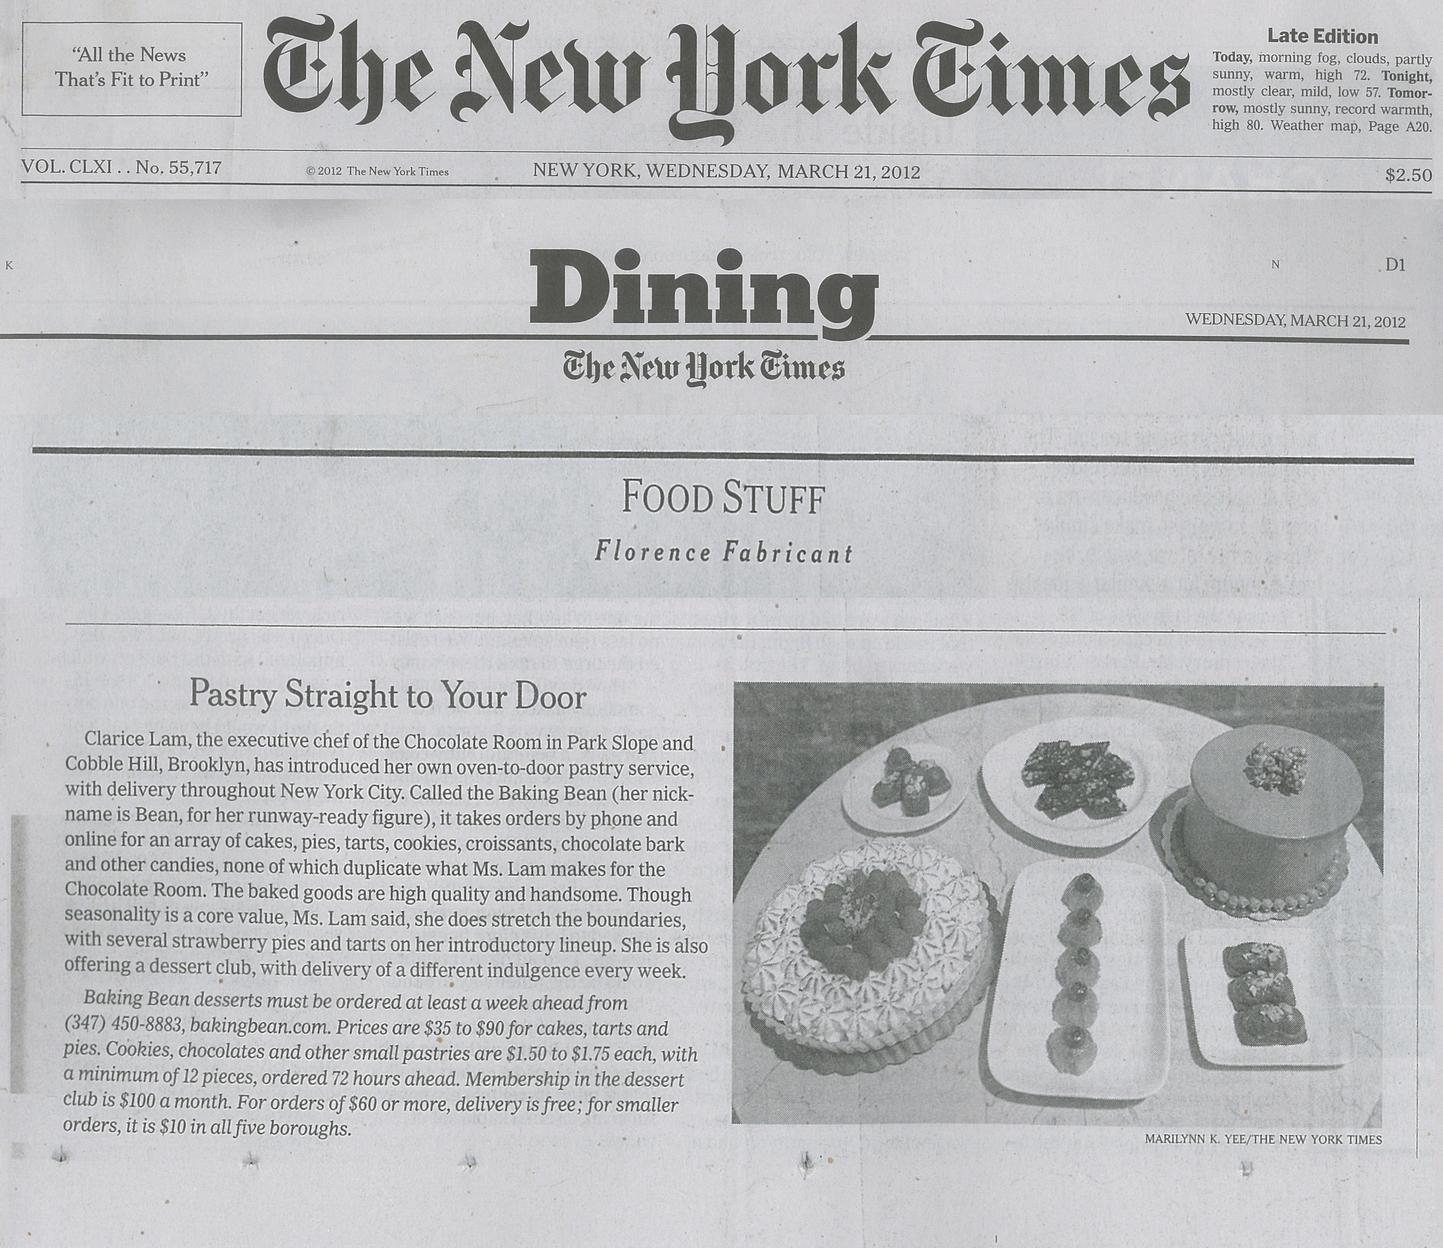 NY_Times_March_21_2012.jpg